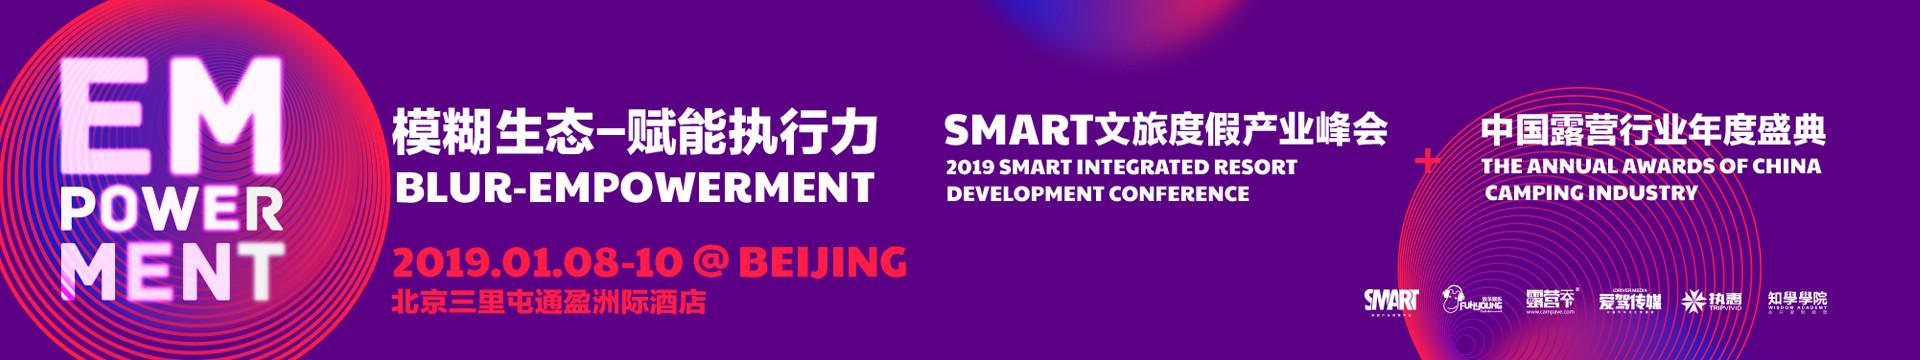 2019SMART文旅度假产业峰会(北京)